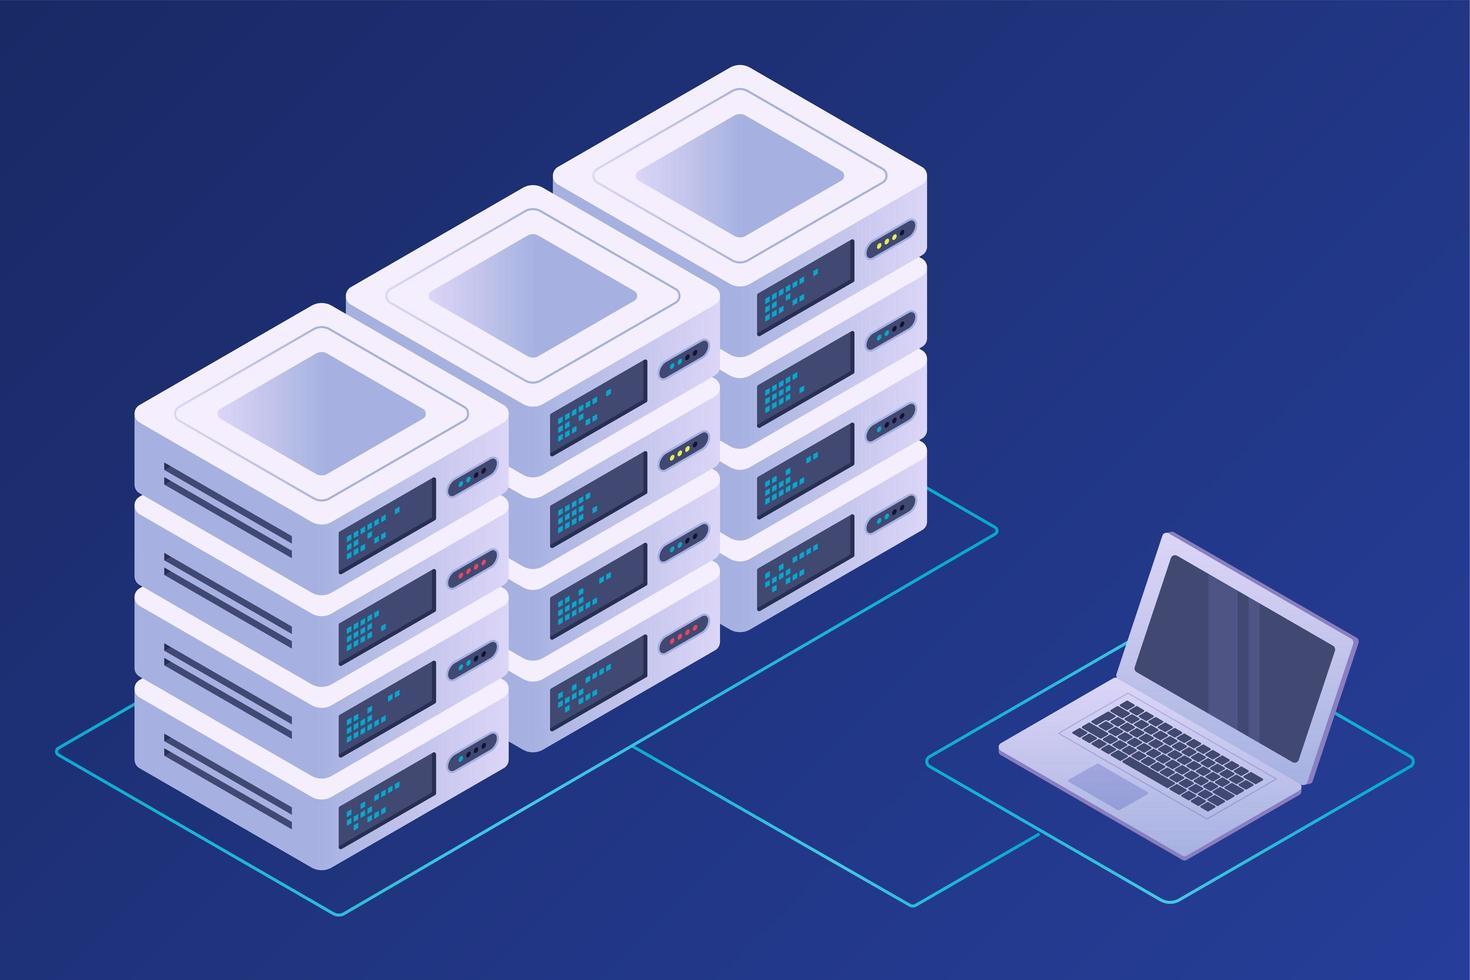 begreppet datacenter, server, databas och teknik vektor